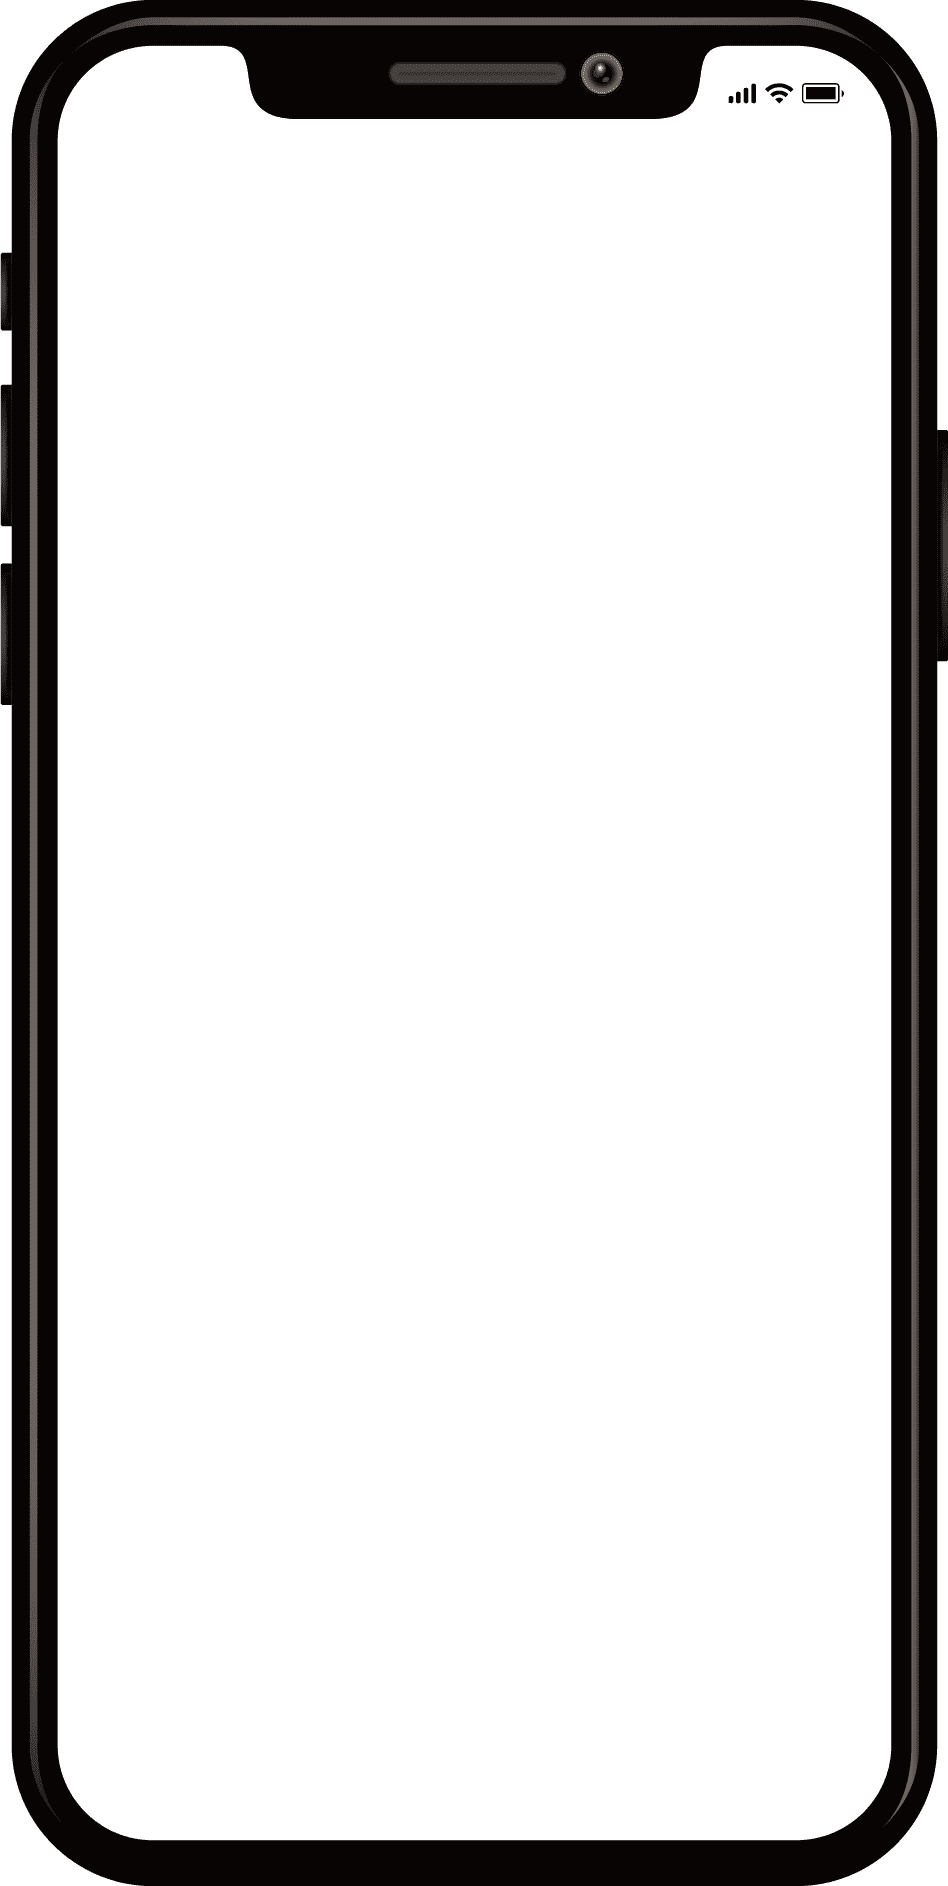 iphoneに写ったGR-smartのロゴ